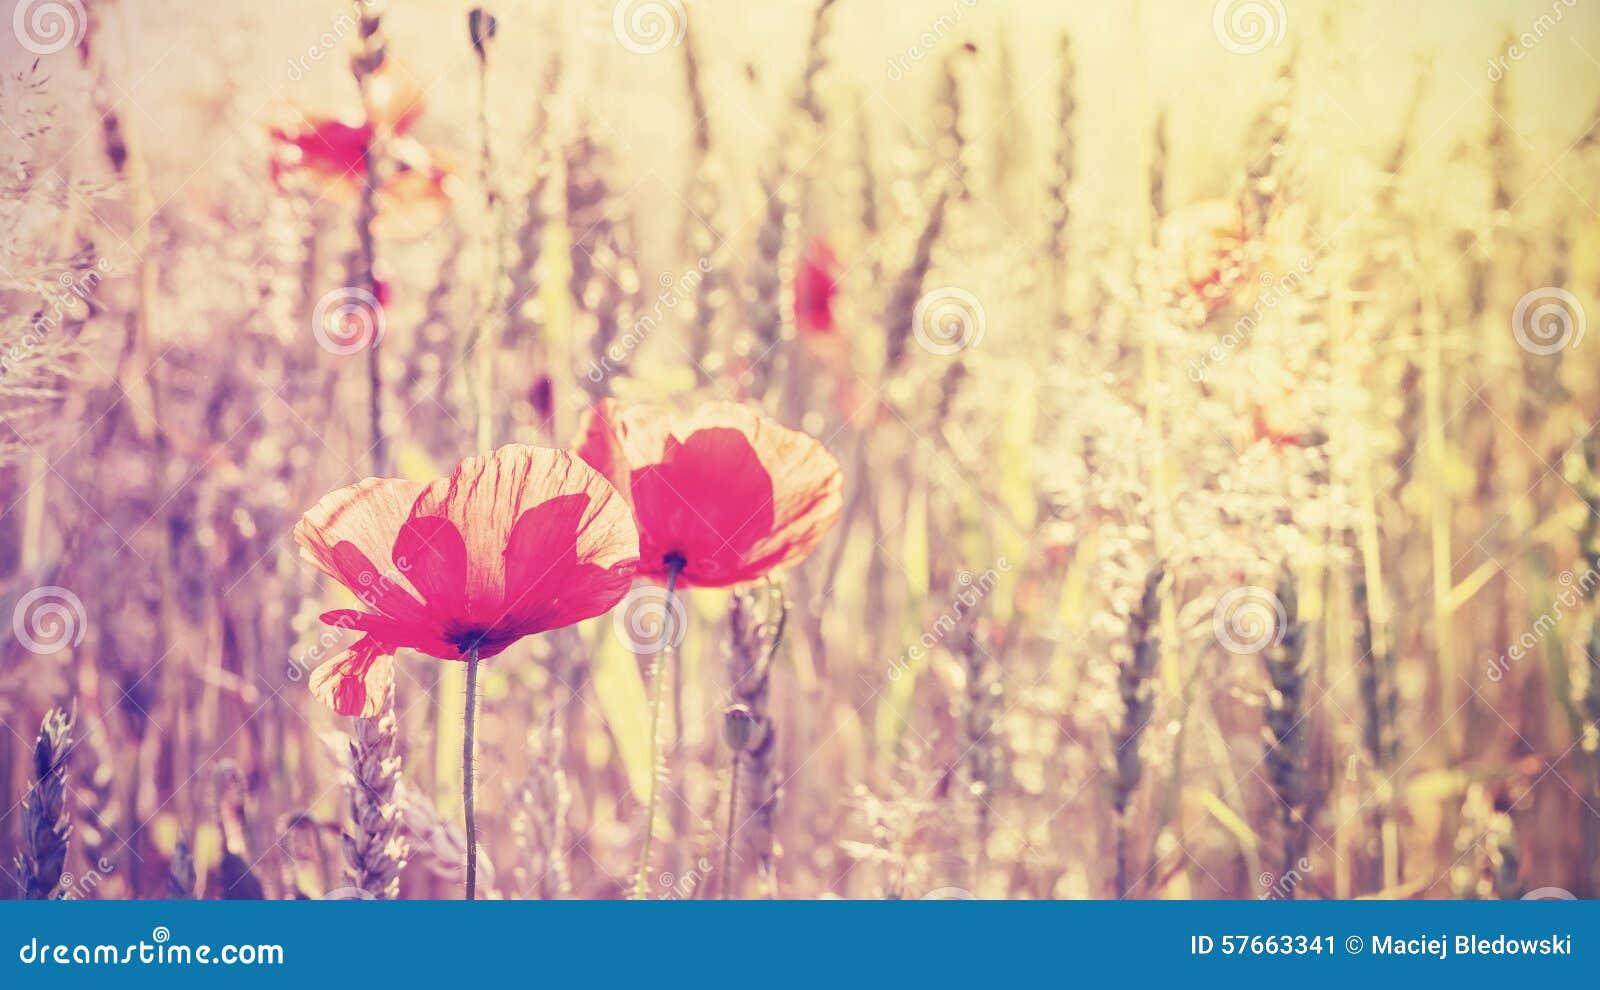 Weinlese tonte Mohnblumenblumen bei Sonnenaufgang